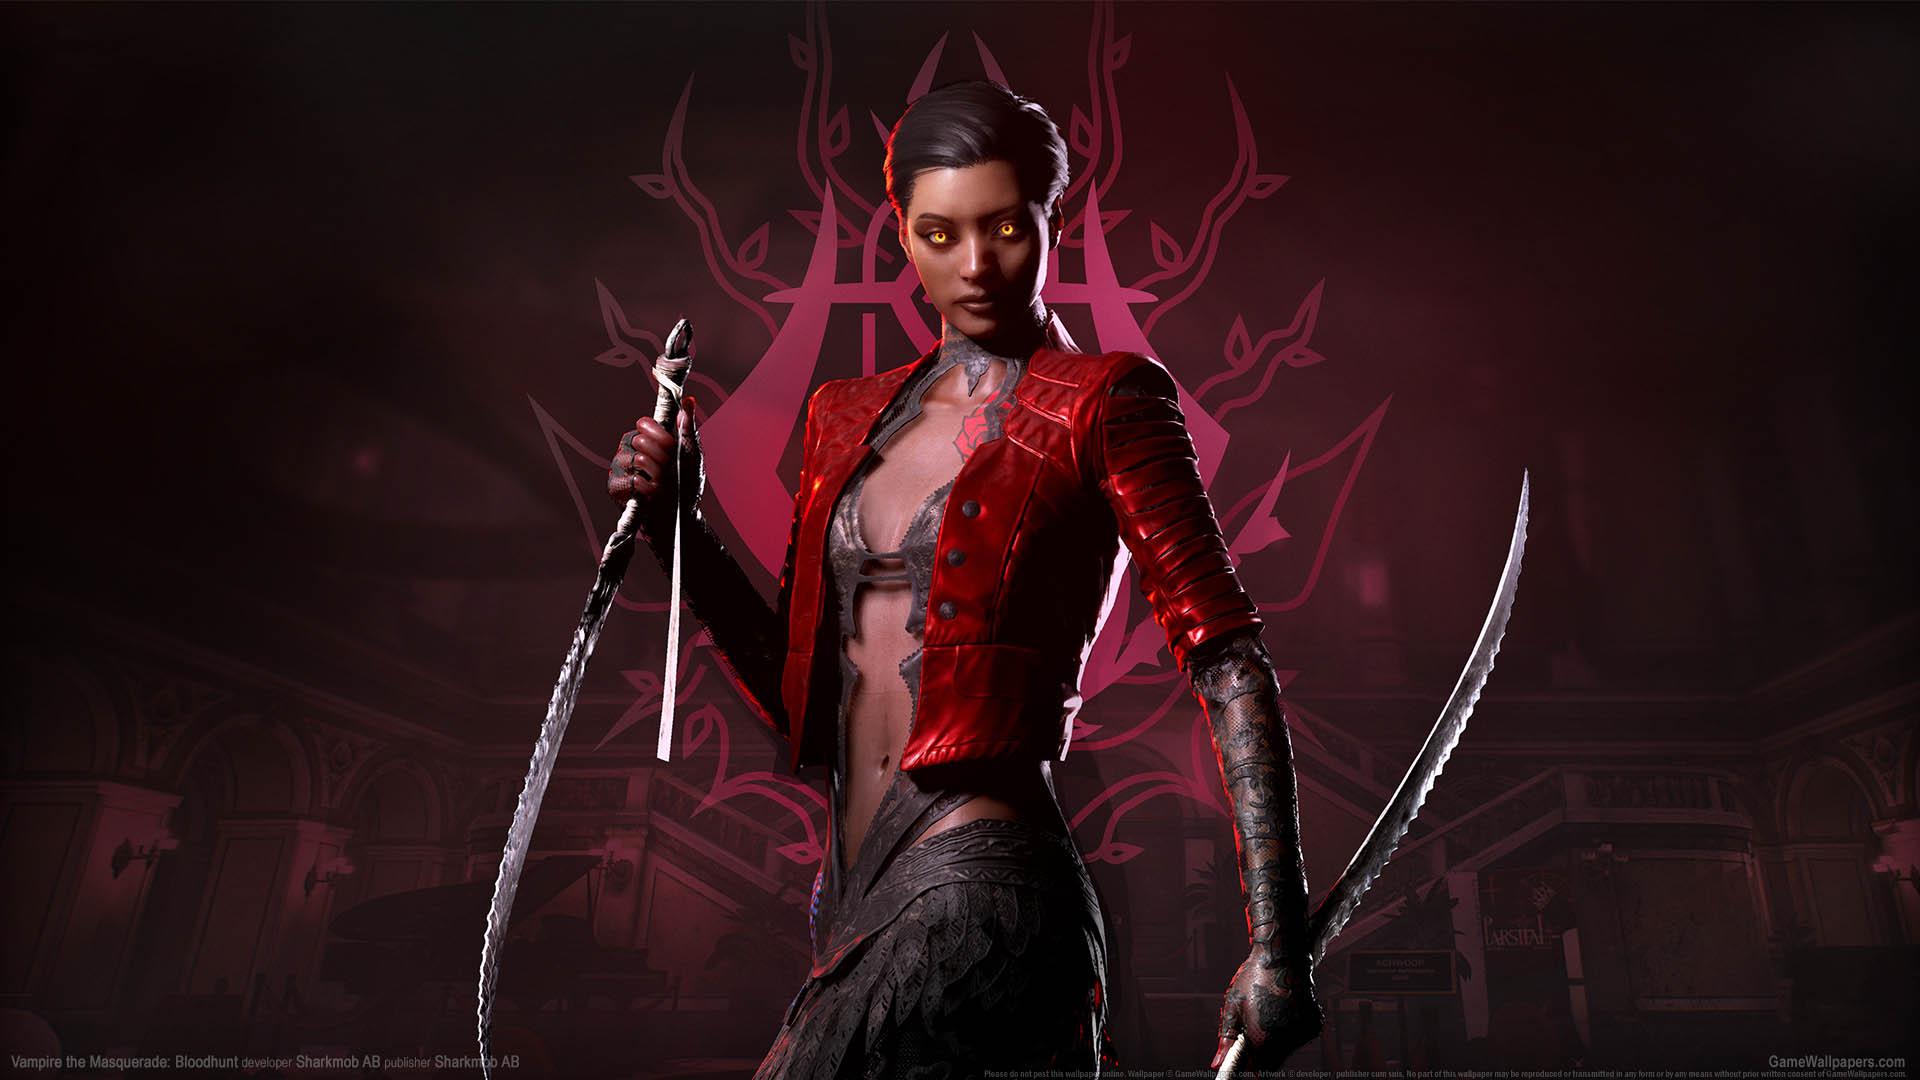 Vampire: The Masquerade Bloodhunt fondo de escritorio 02 1920x1080